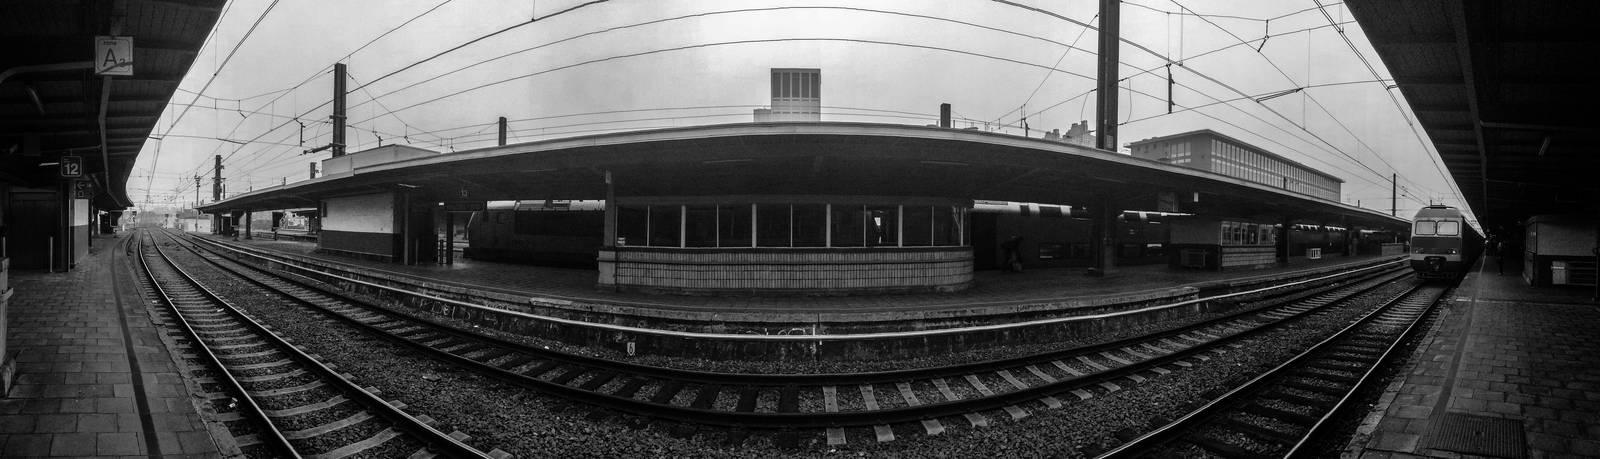 Panorama of Platform #12